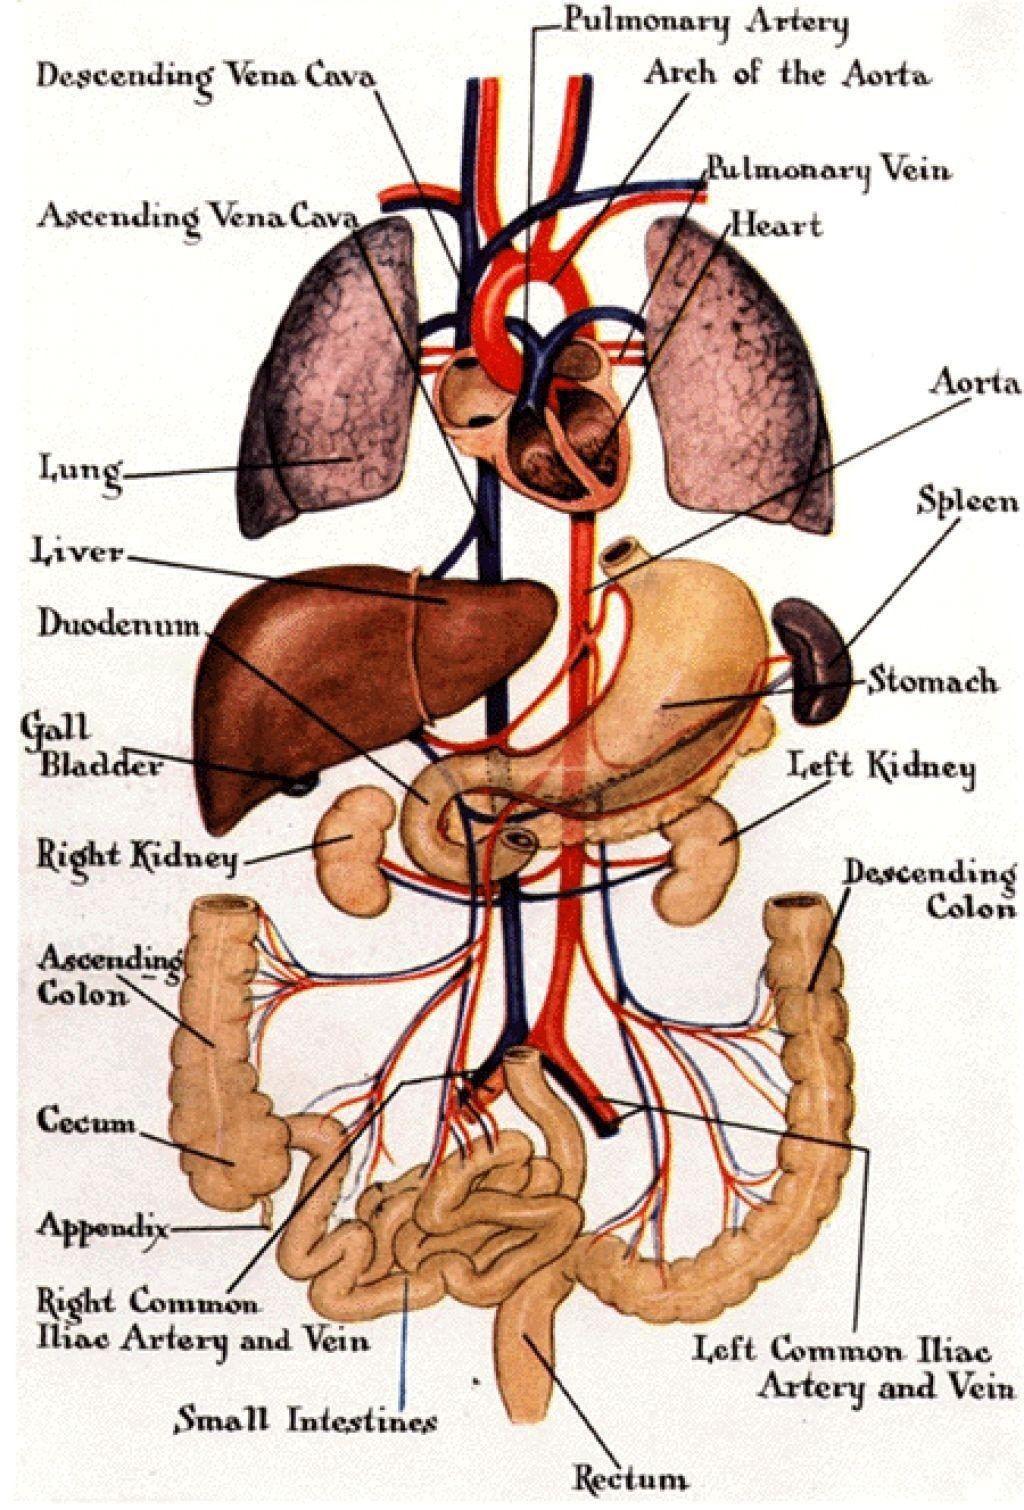 Internal Human Body Diagram Human Anatomy Pictures Pinterest